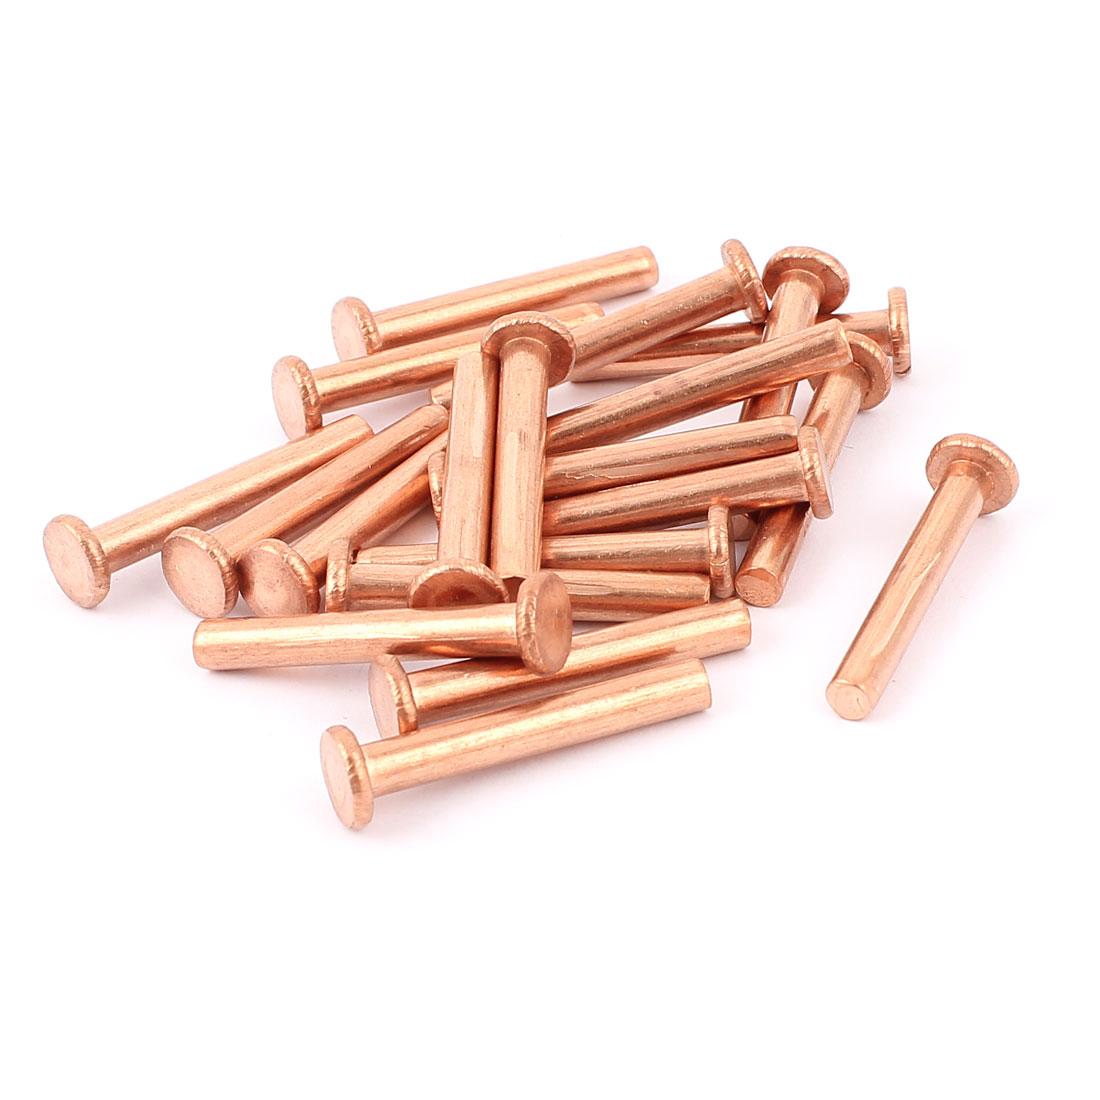 "20 Pcs 13/64"" Diameter 1 3/8"" Long Shank Flat Head Copper Solid Rivets Fasteners"